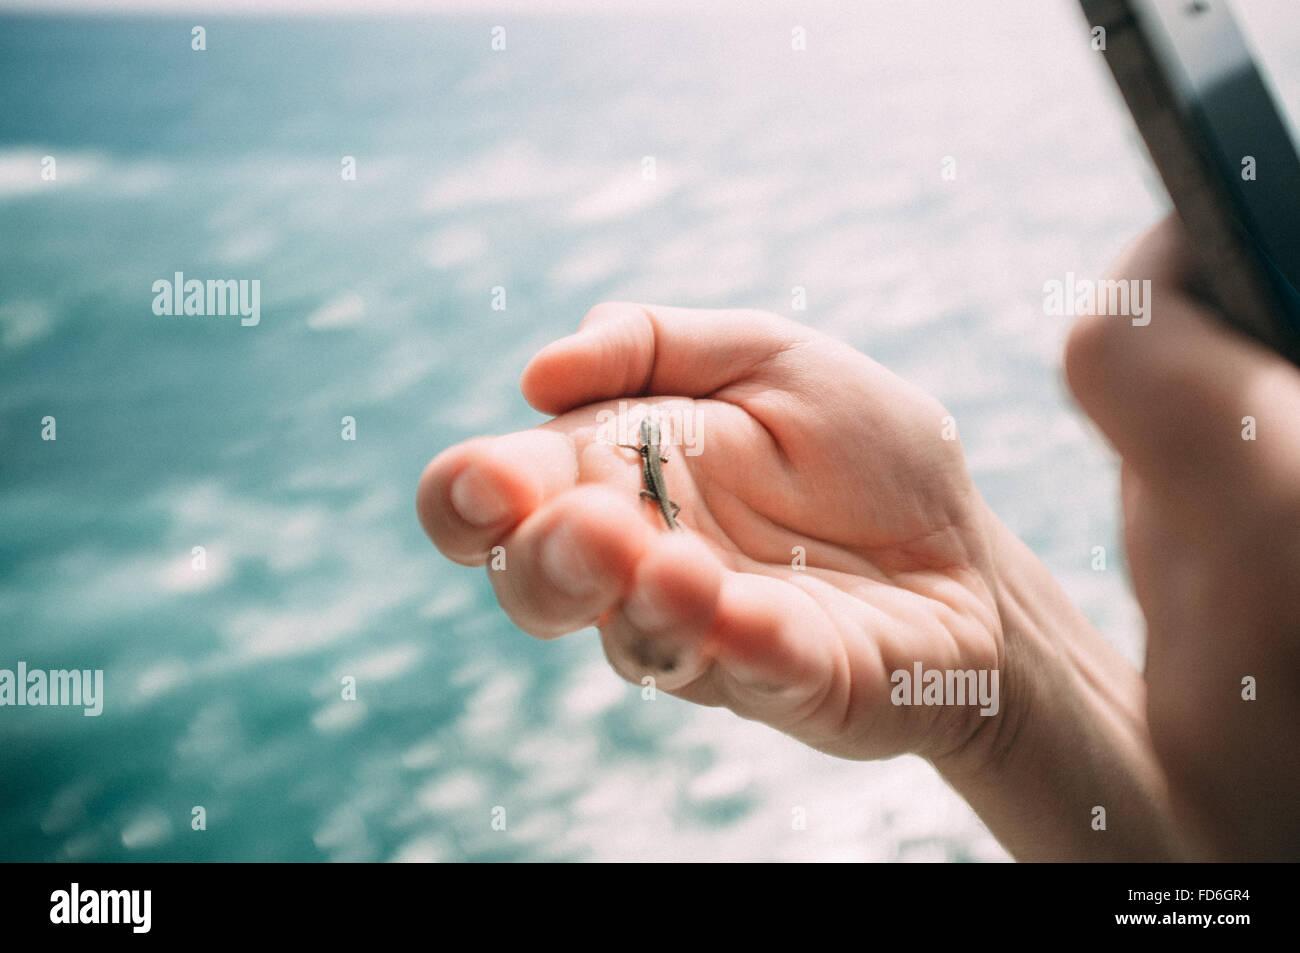 Insecto en mano humana Imagen De Stock